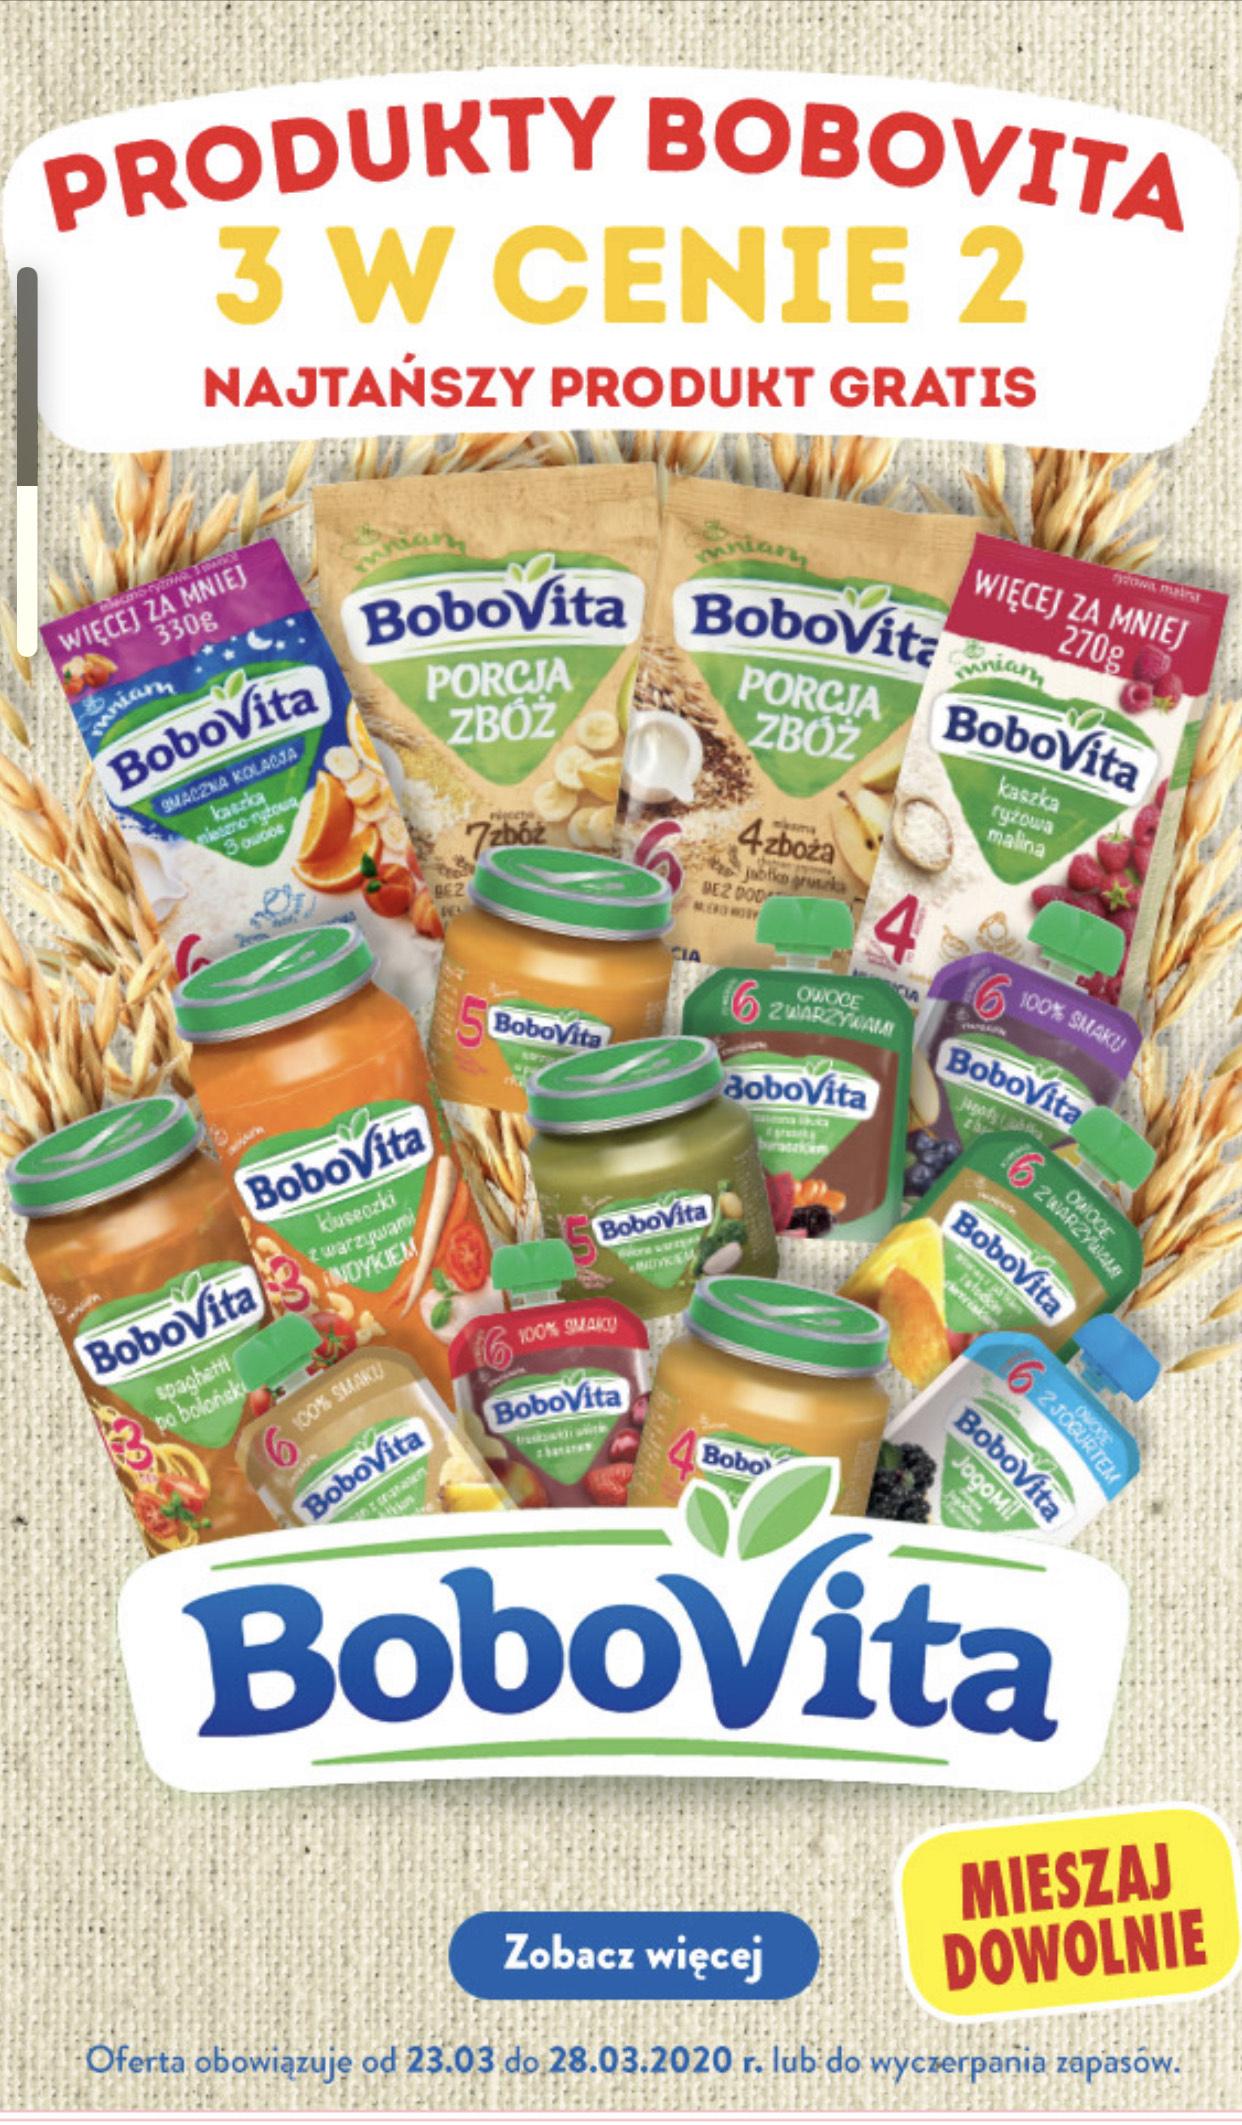 Bobovita w Biedronce 2+ 1 gratis